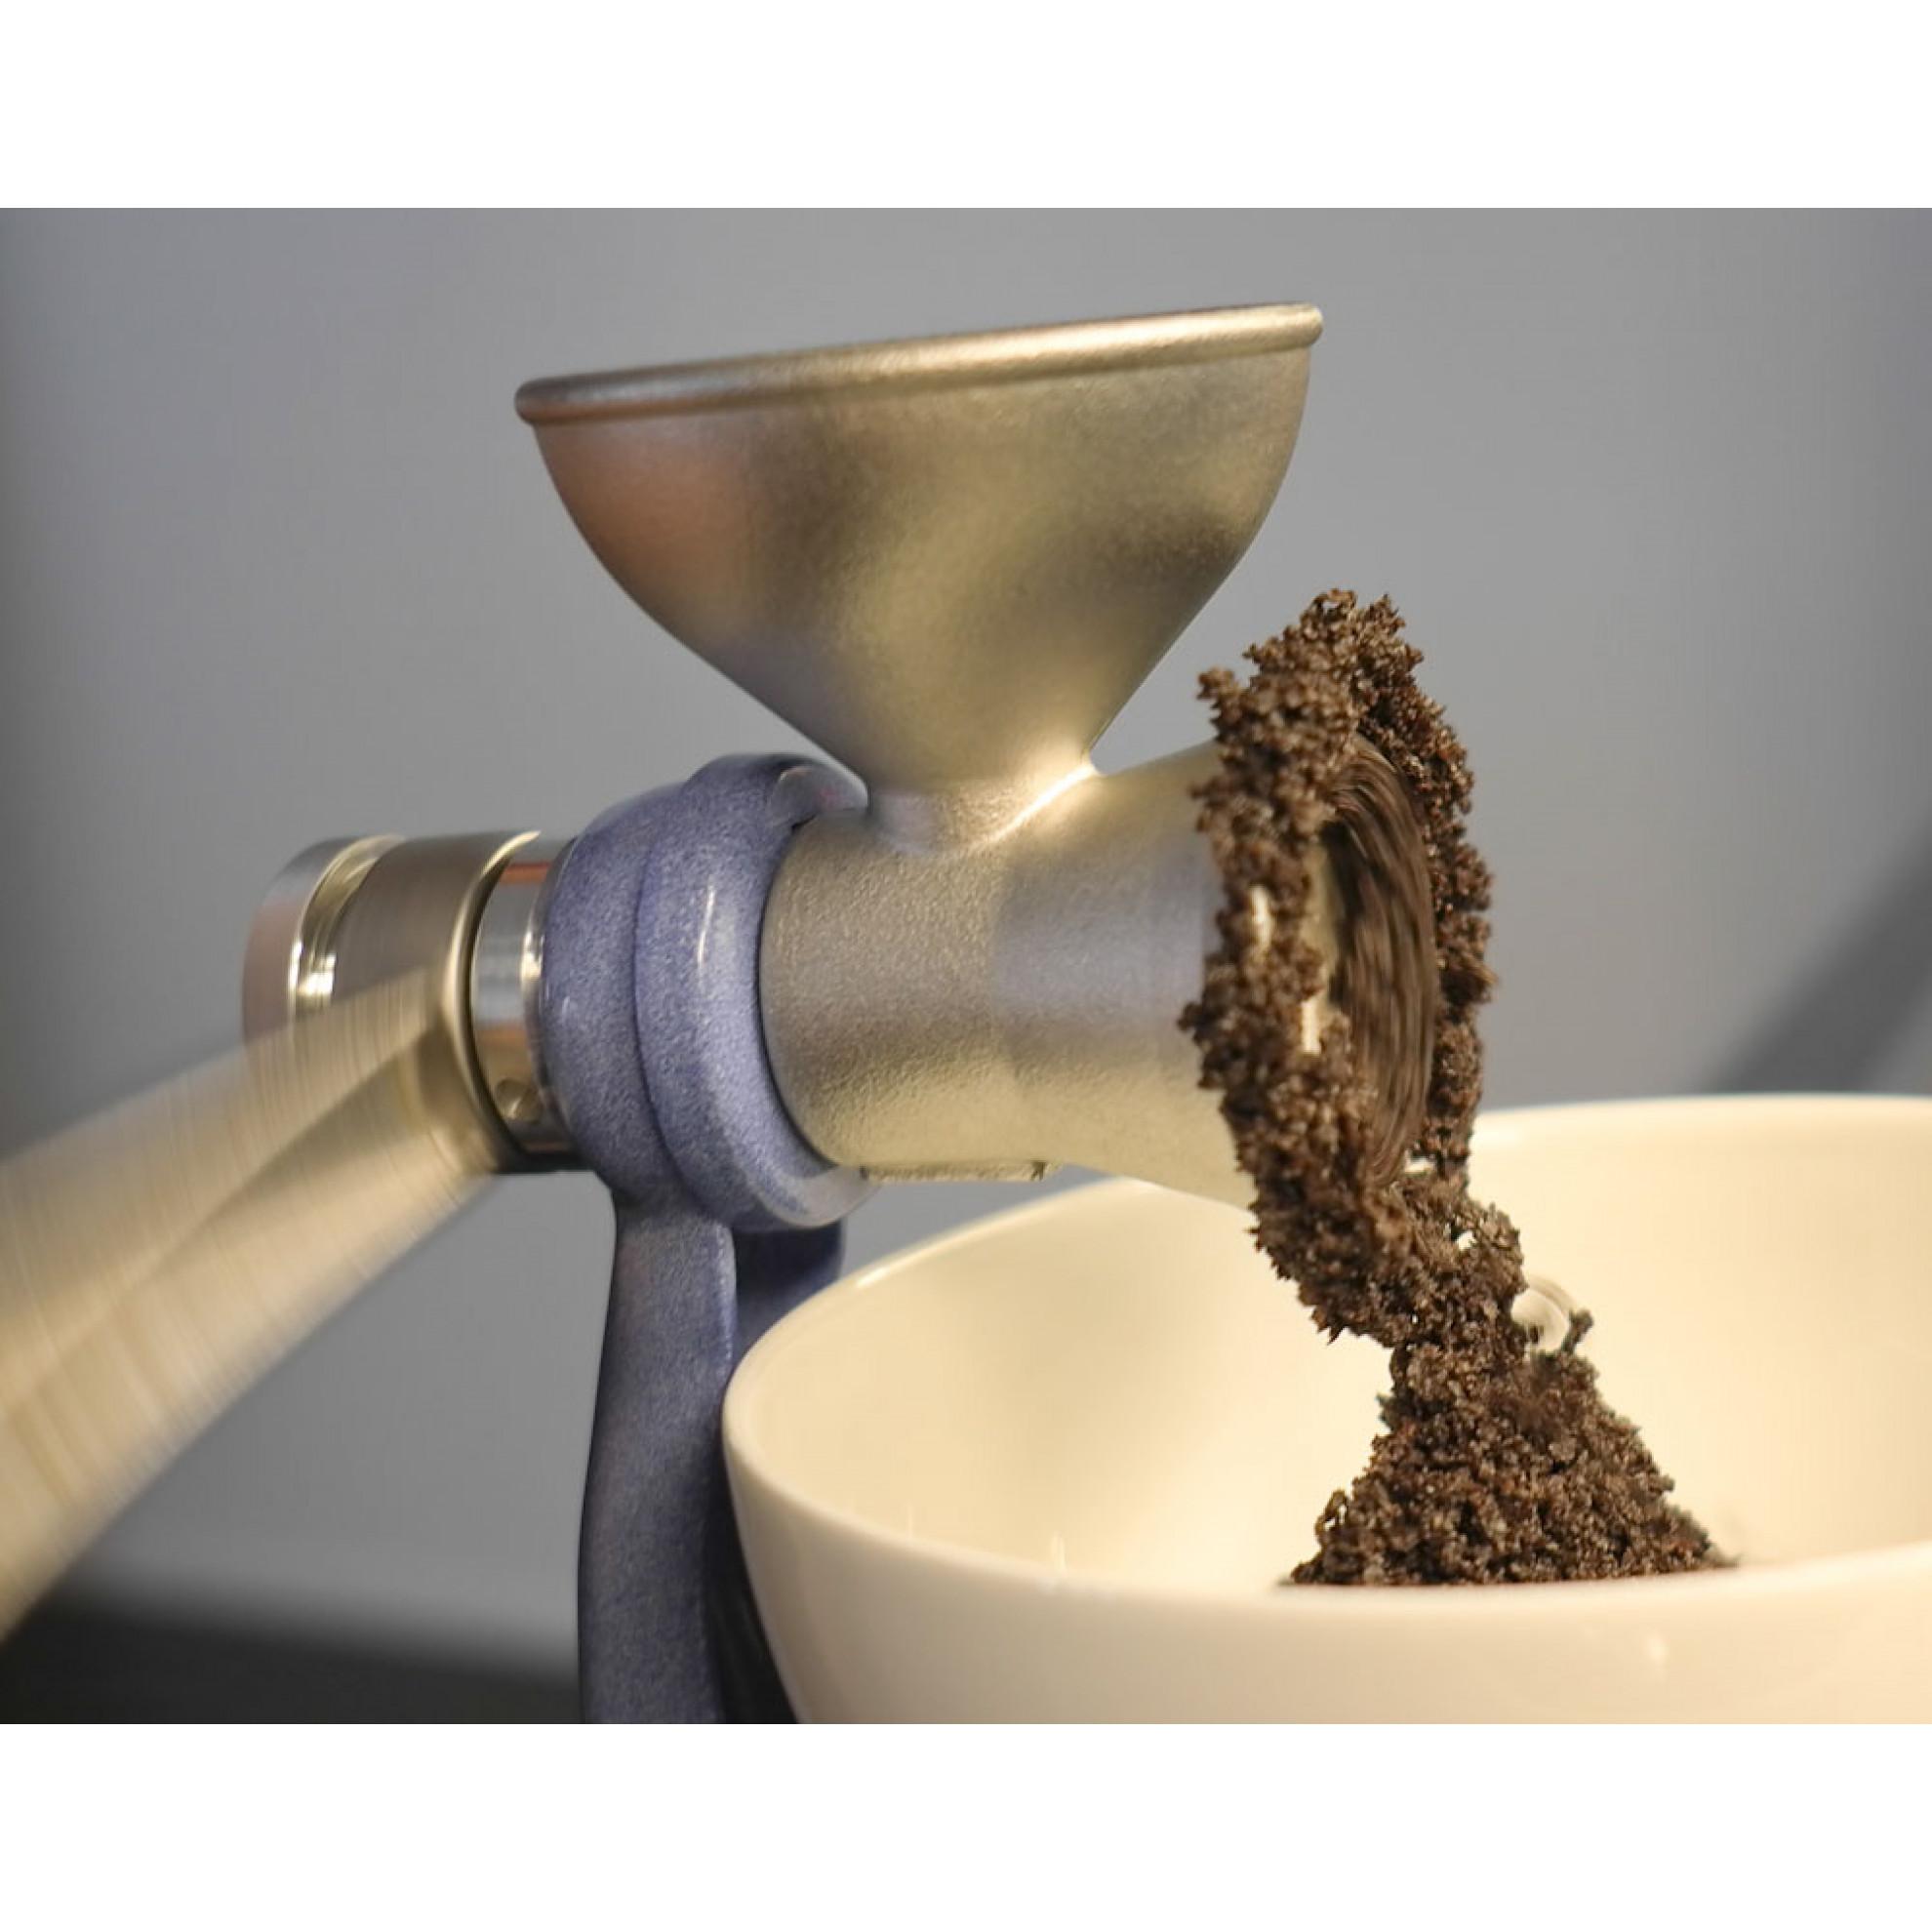 Stainless steel manual pepper mill salt & pepper spice grinder.